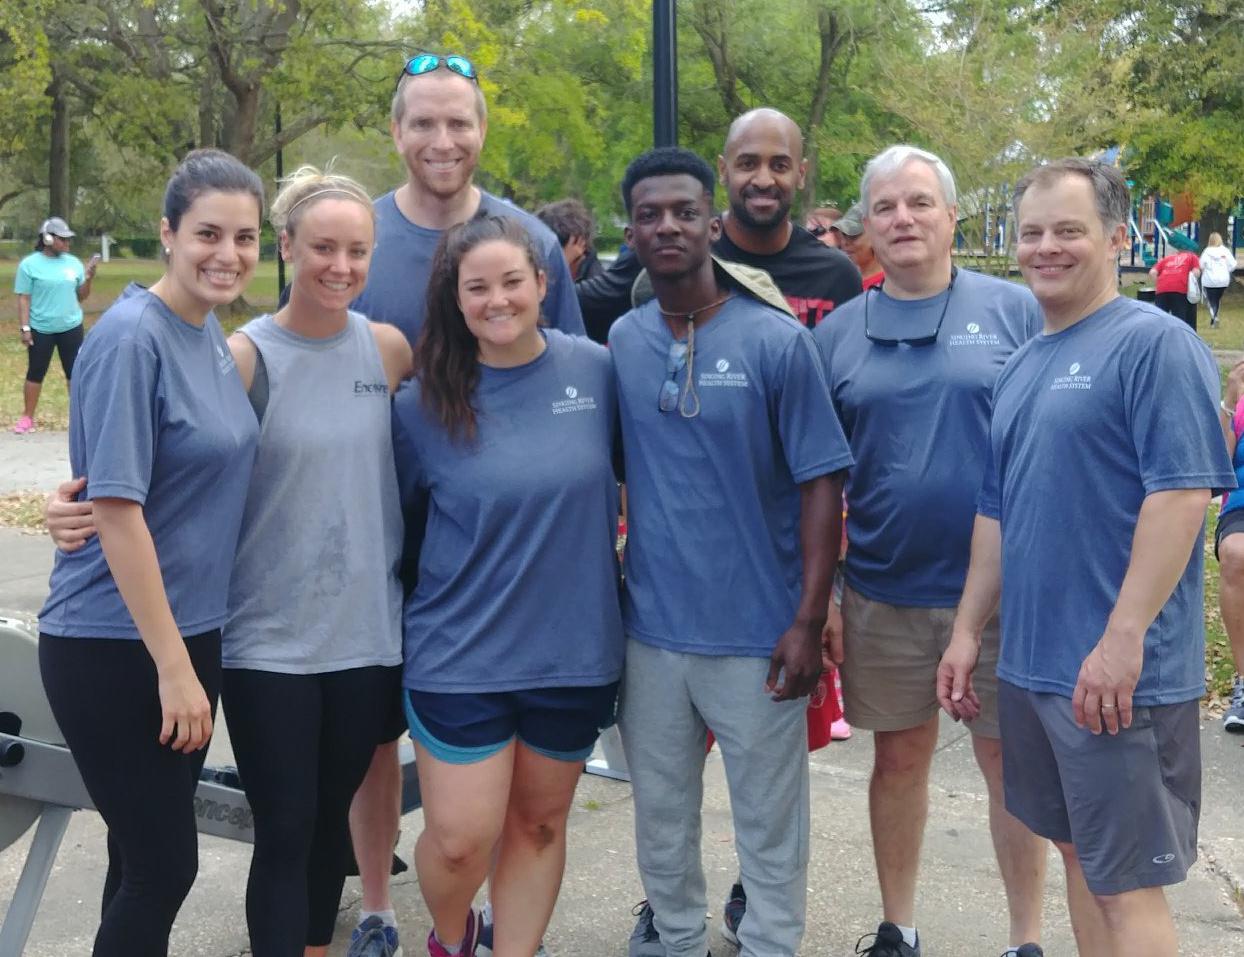 Encore Rehabilitation-Ocean Springs Neurological Vestibular Rehab at the Heart Walk #EncoreRehab